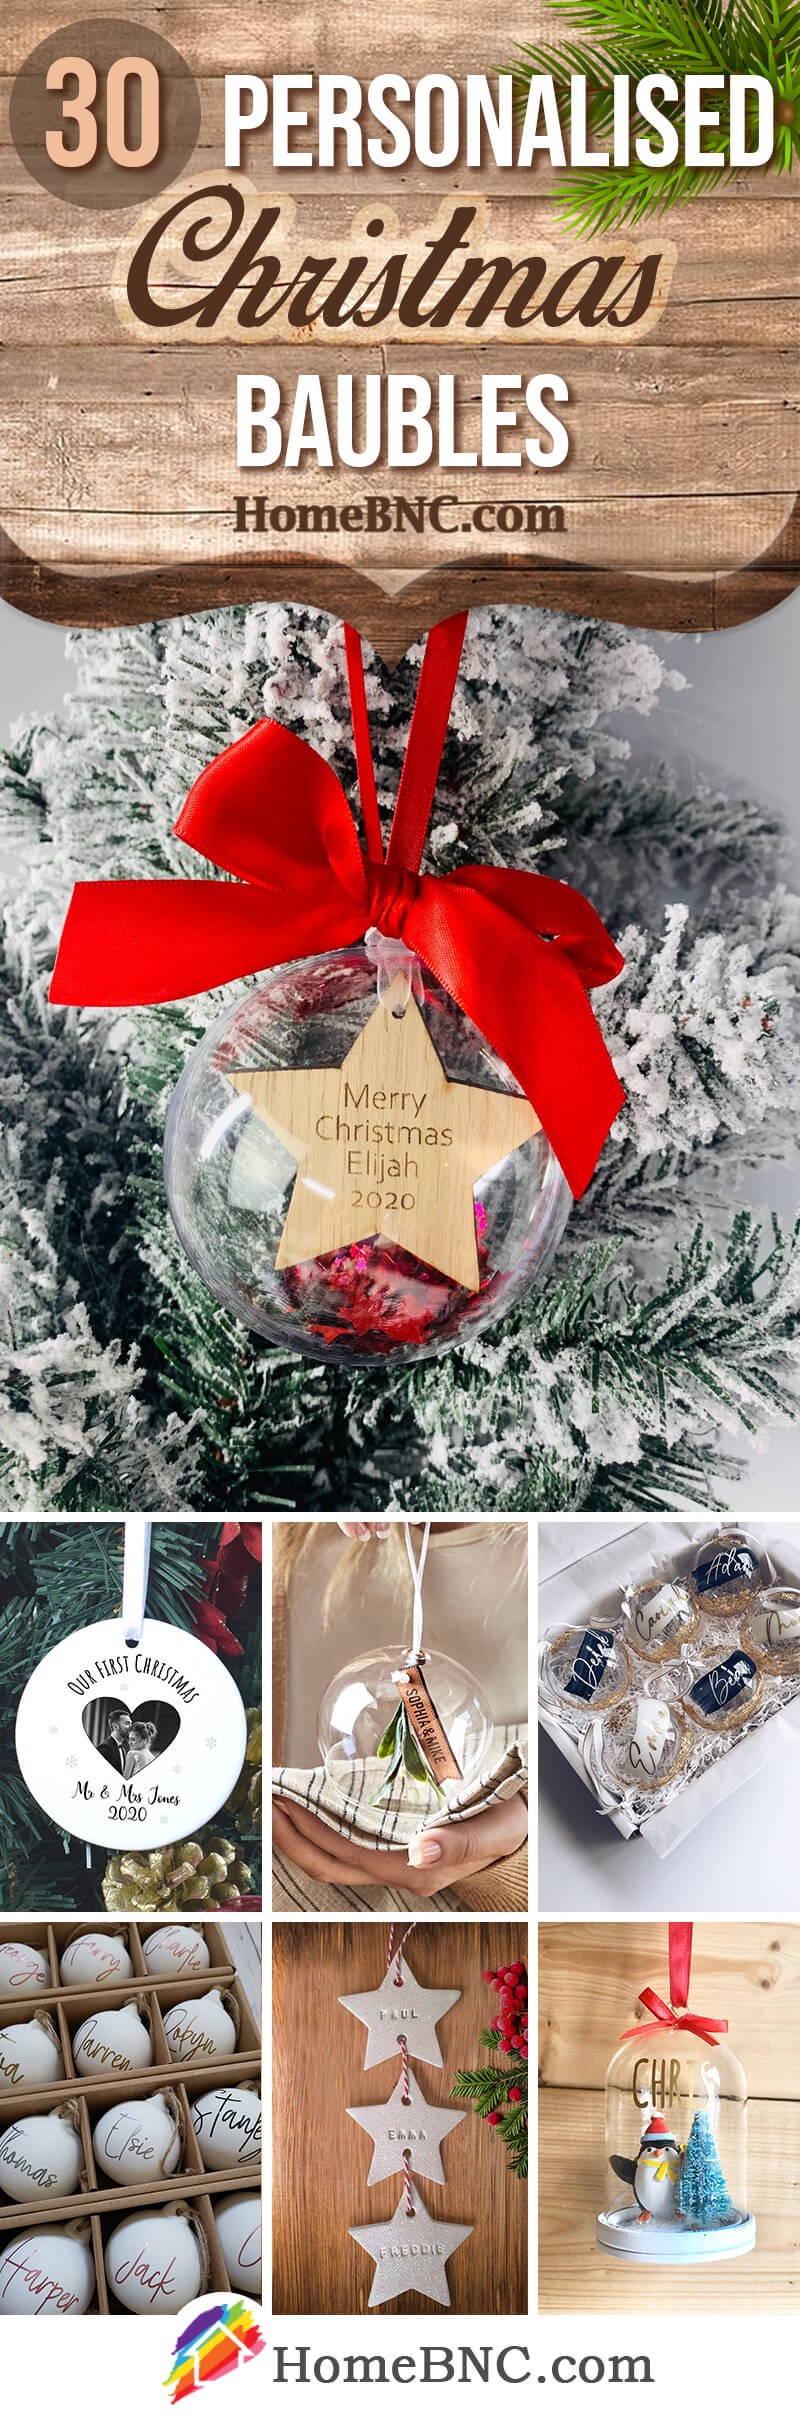 Best Personalised Christmas Baubles